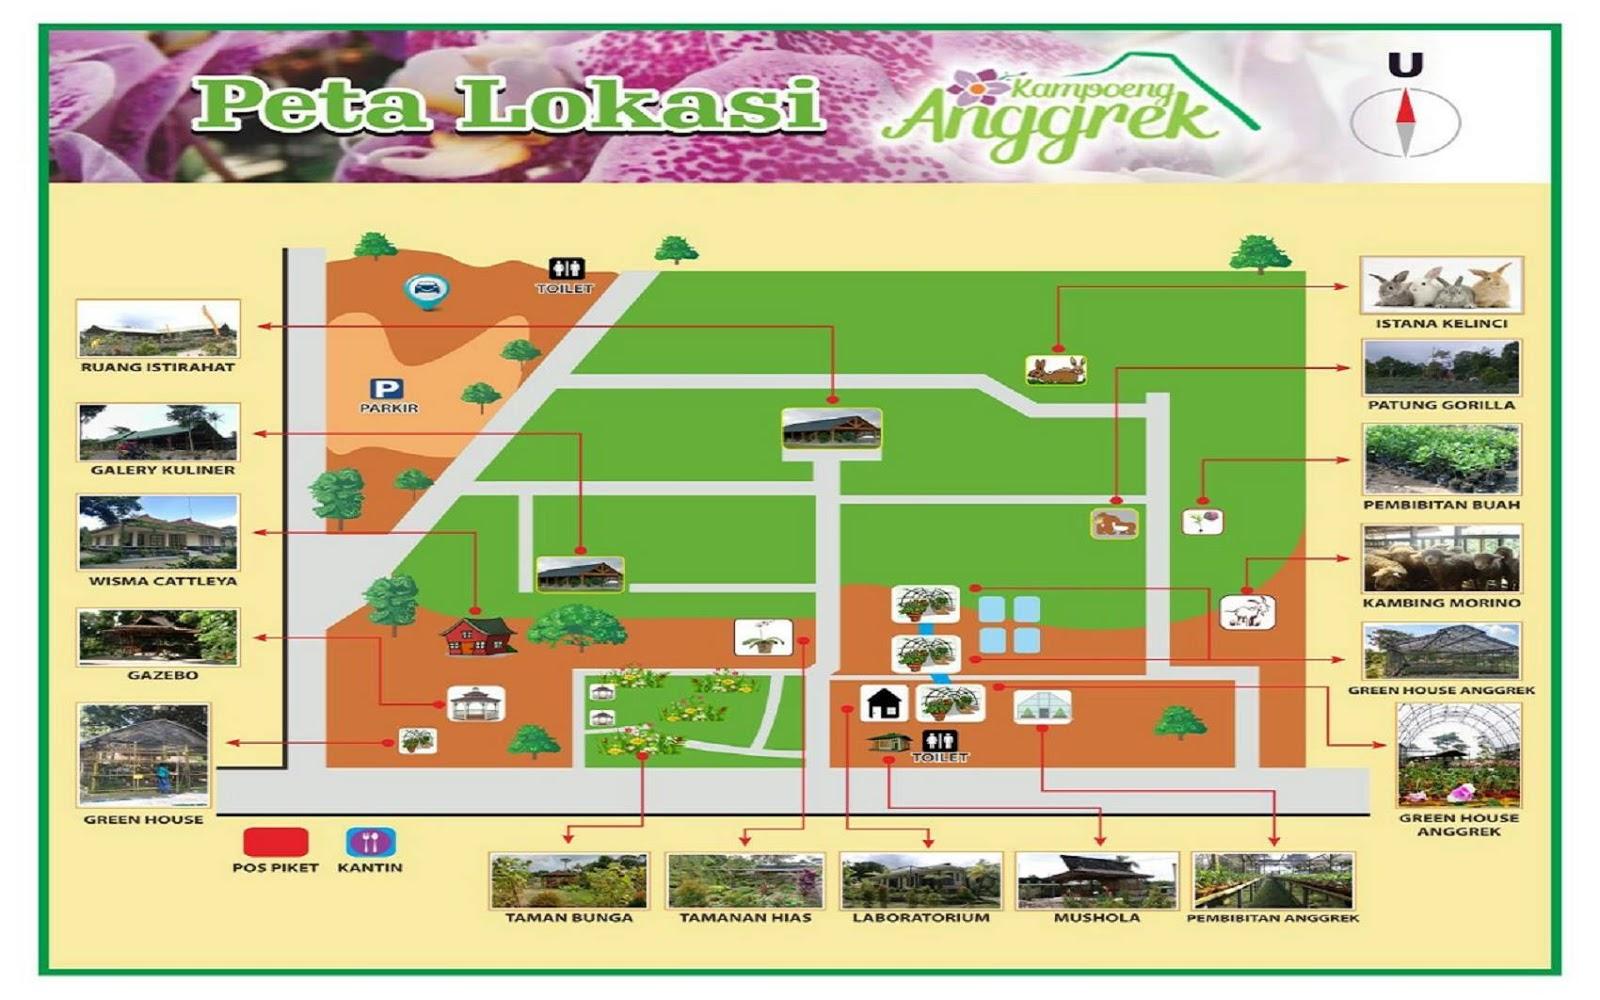 Triaveler Paredise 2 Kebun Nanas Kampung Anggrek Peta Kediri Kab